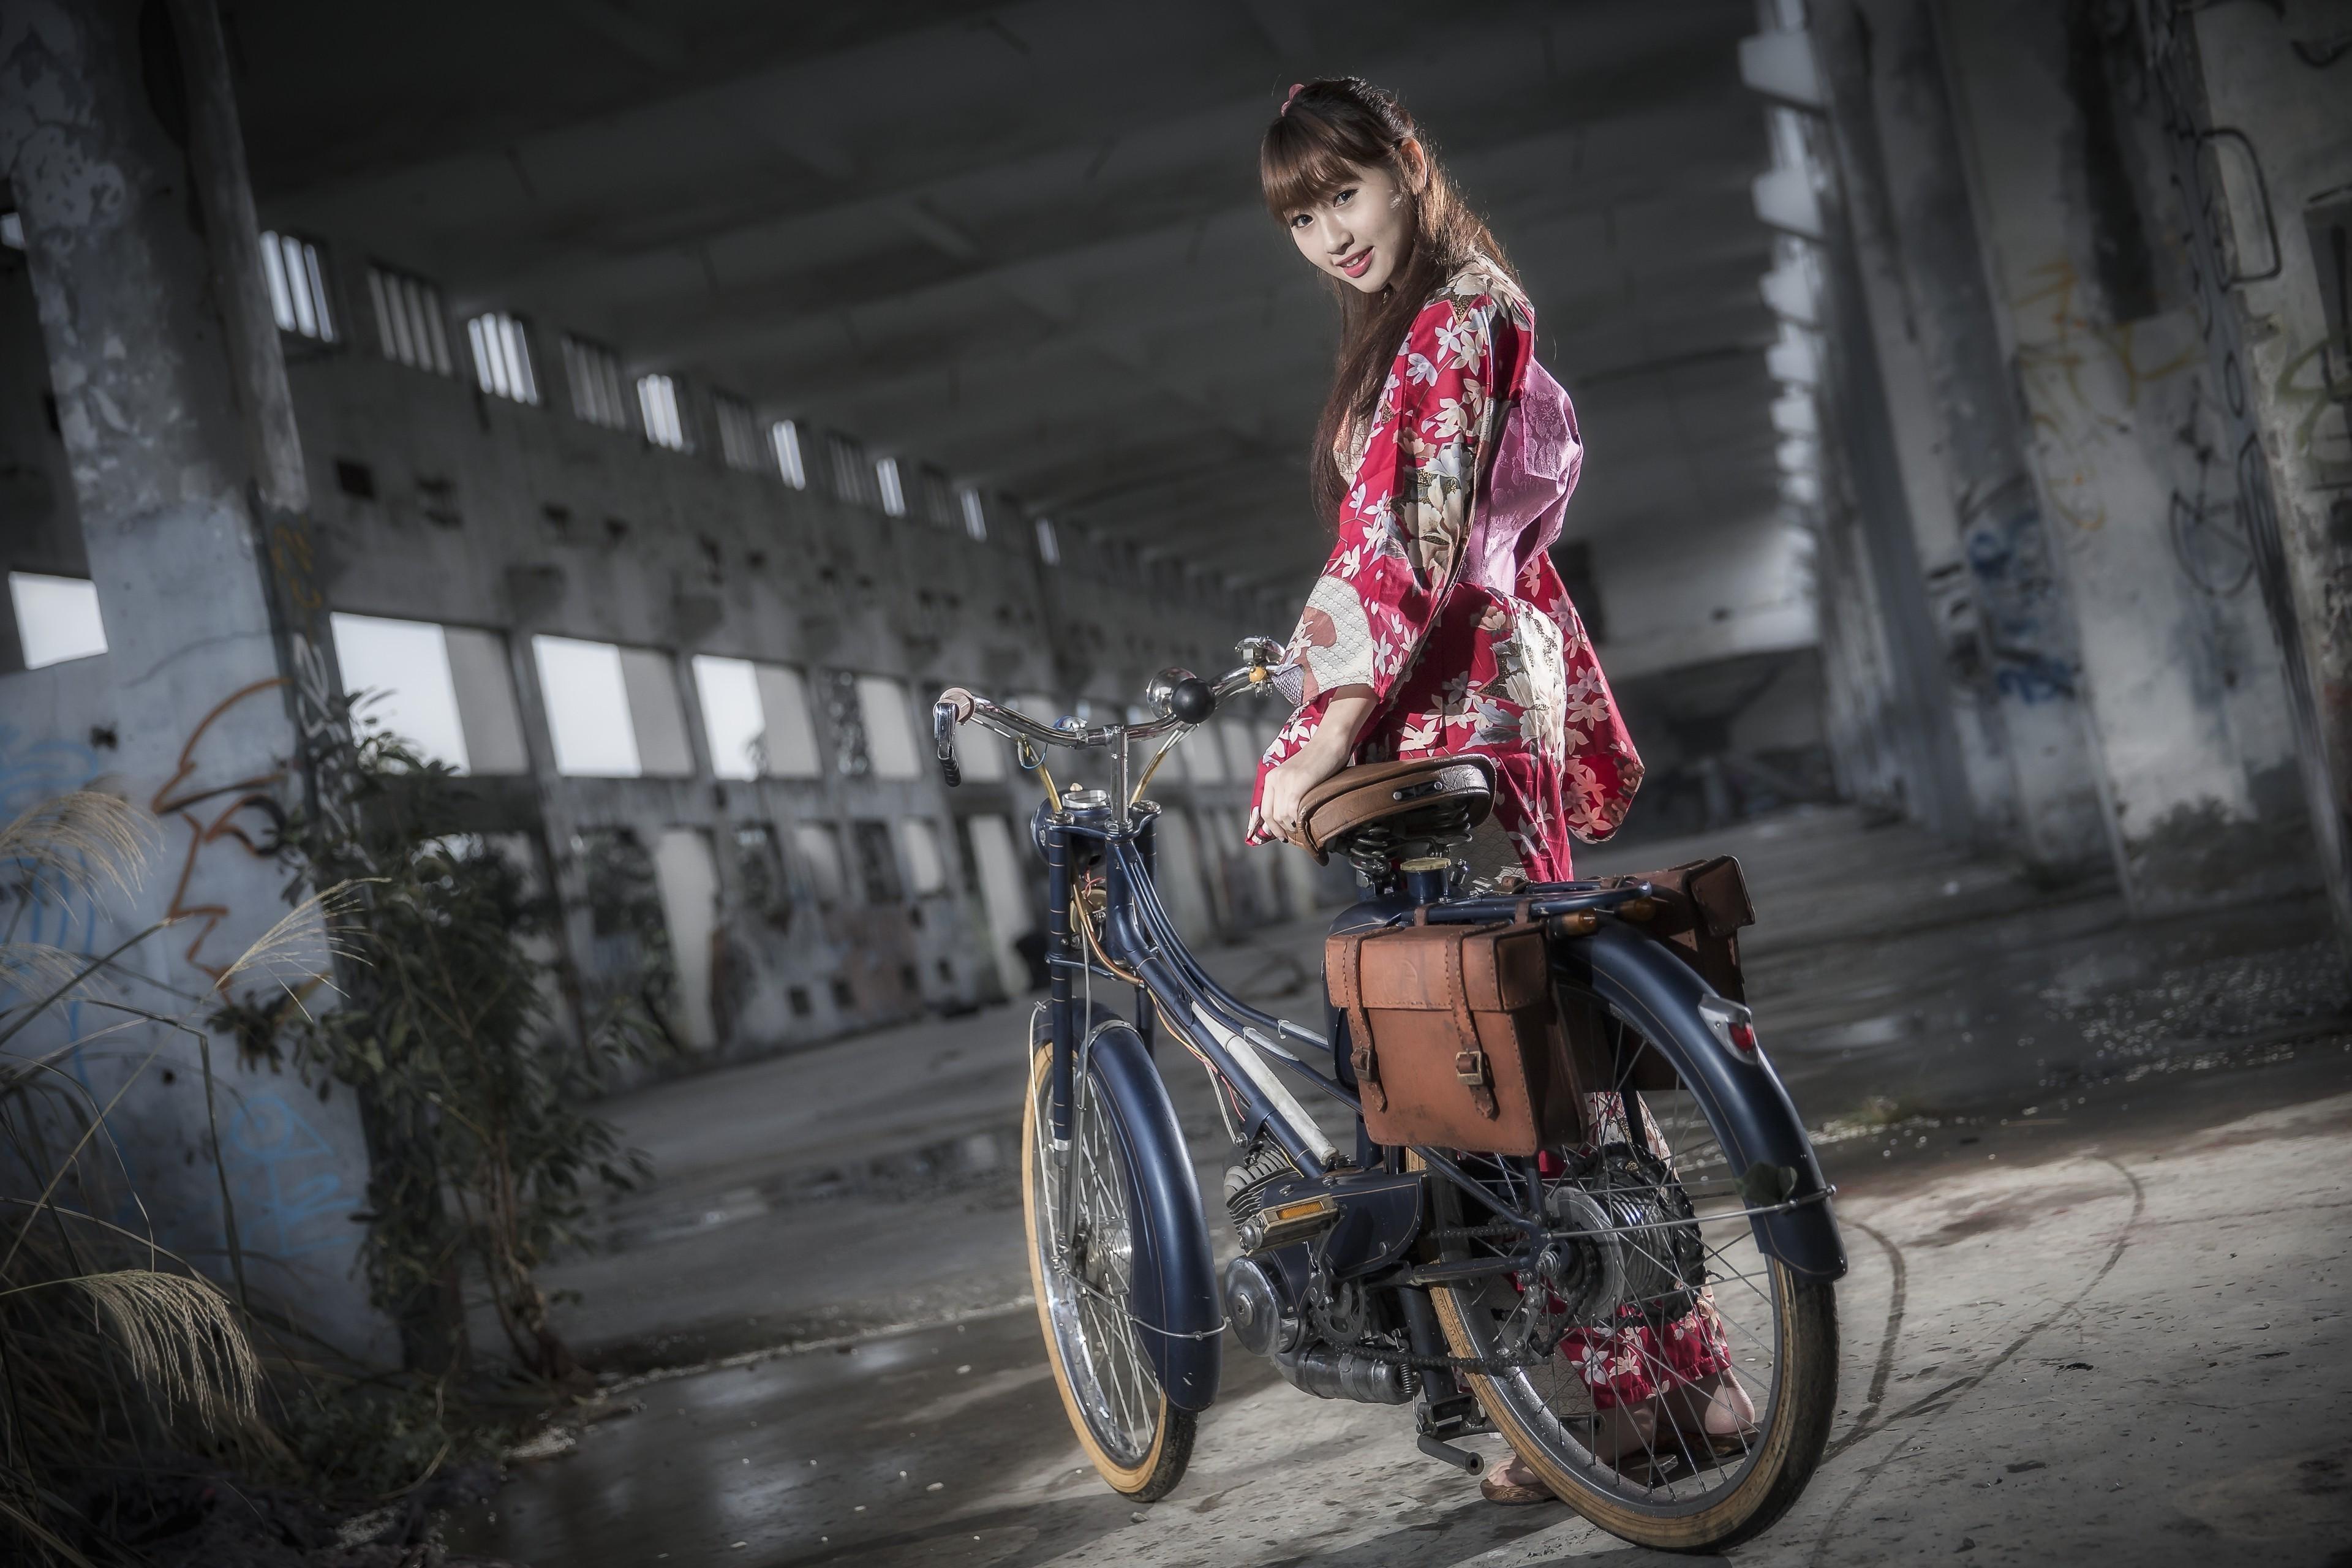 Wallpaper Women Model Street Bicycle Asian Motorcycle